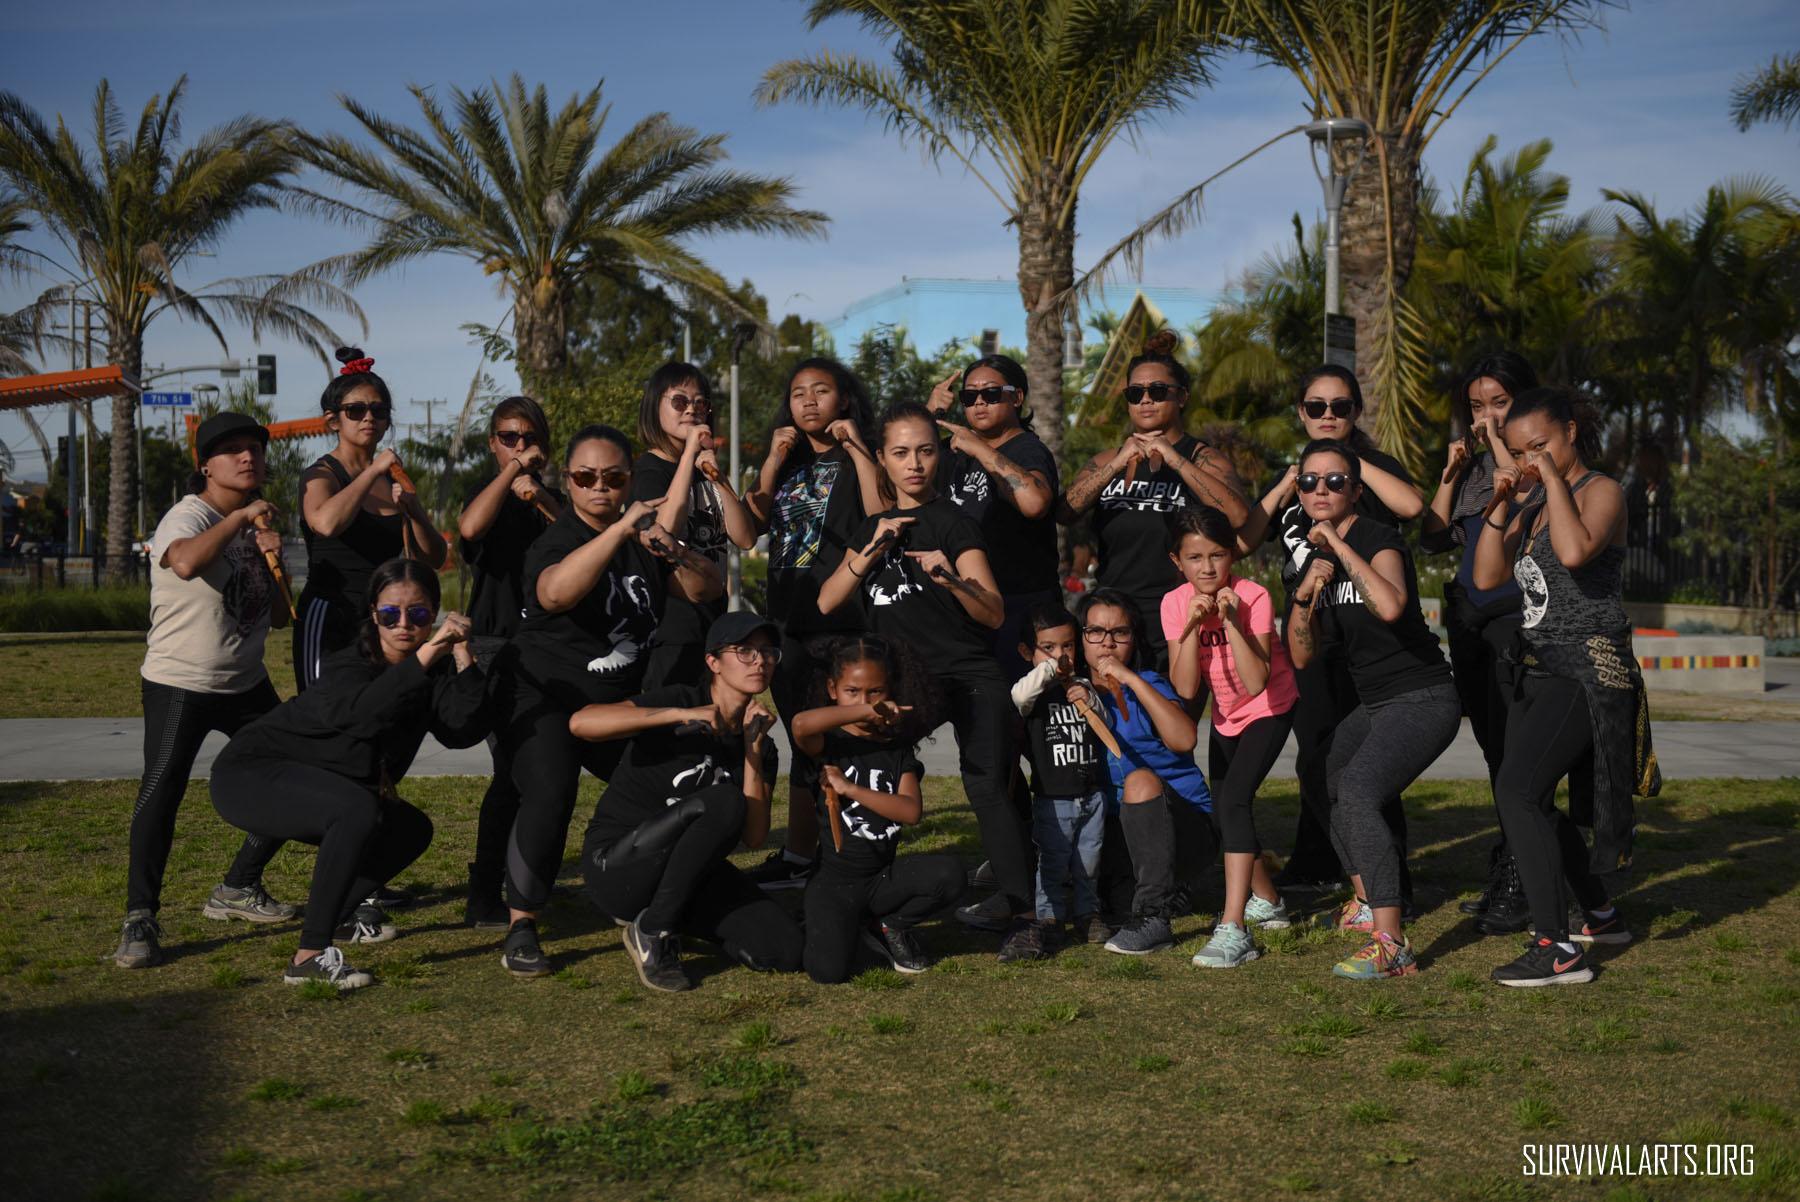 Survival Arts Long Beach 2019.jpg